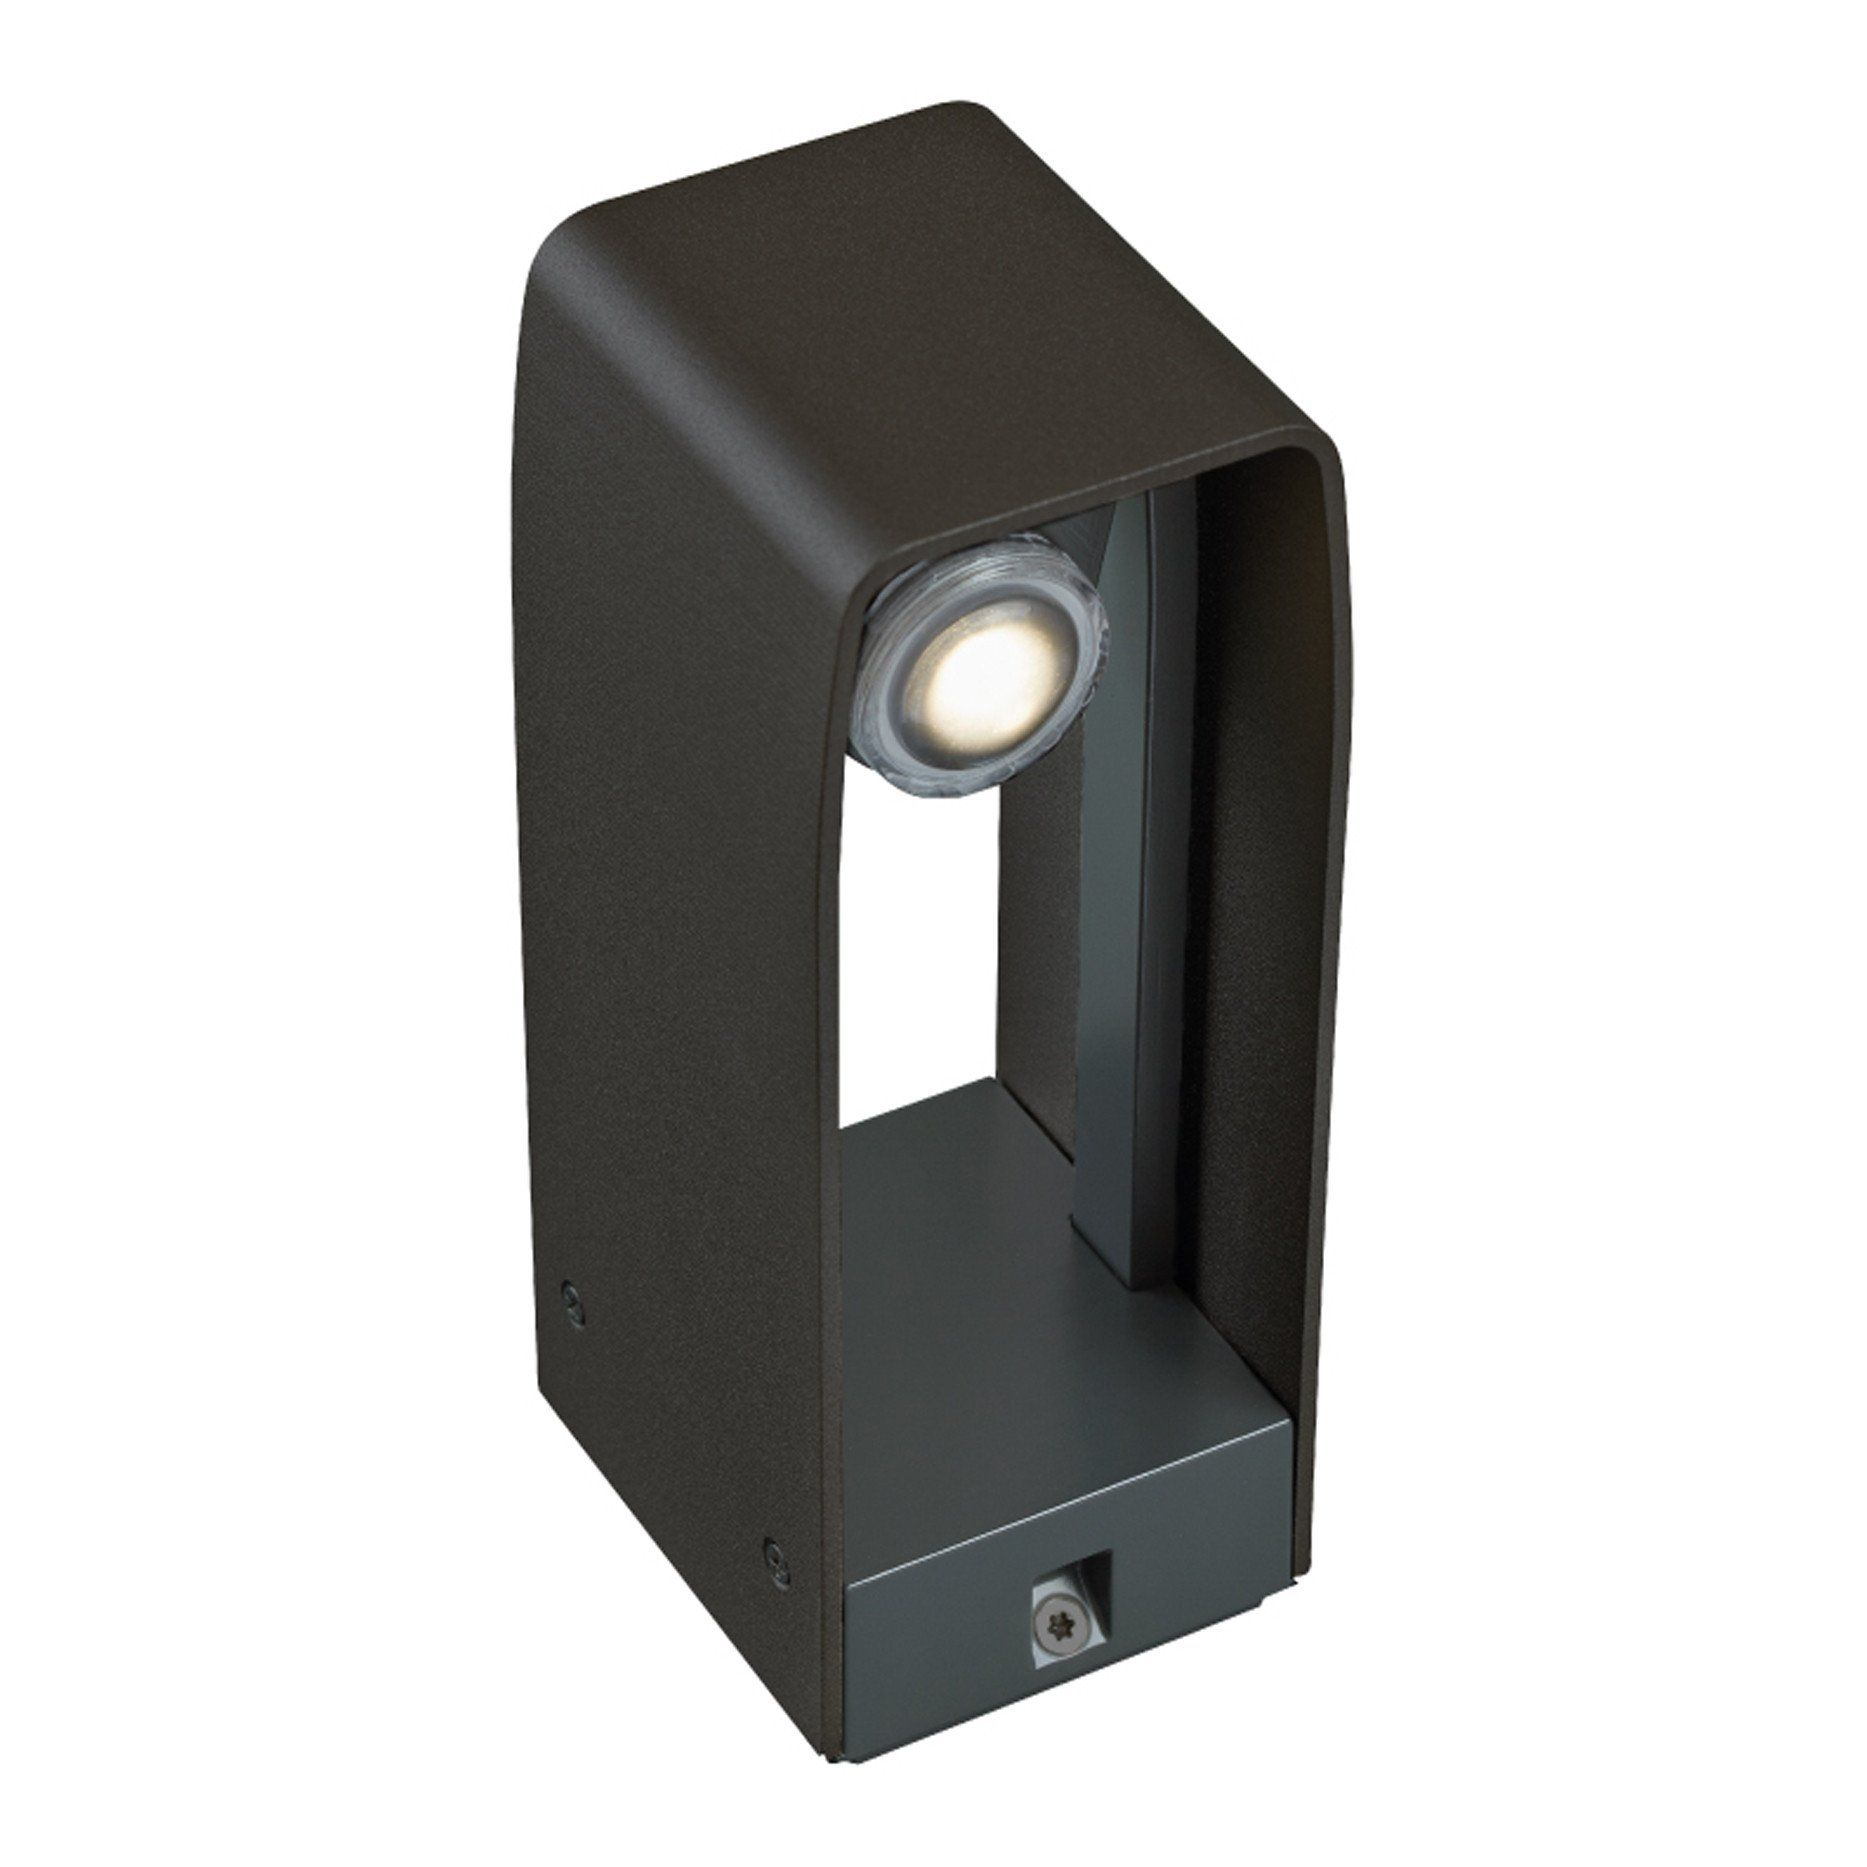 In Lite Ace Dark 12v Led Low Voltage Outdoor Post Lights Ip55 In 2020 Outdoor Post Lights Post Lights 12v Led